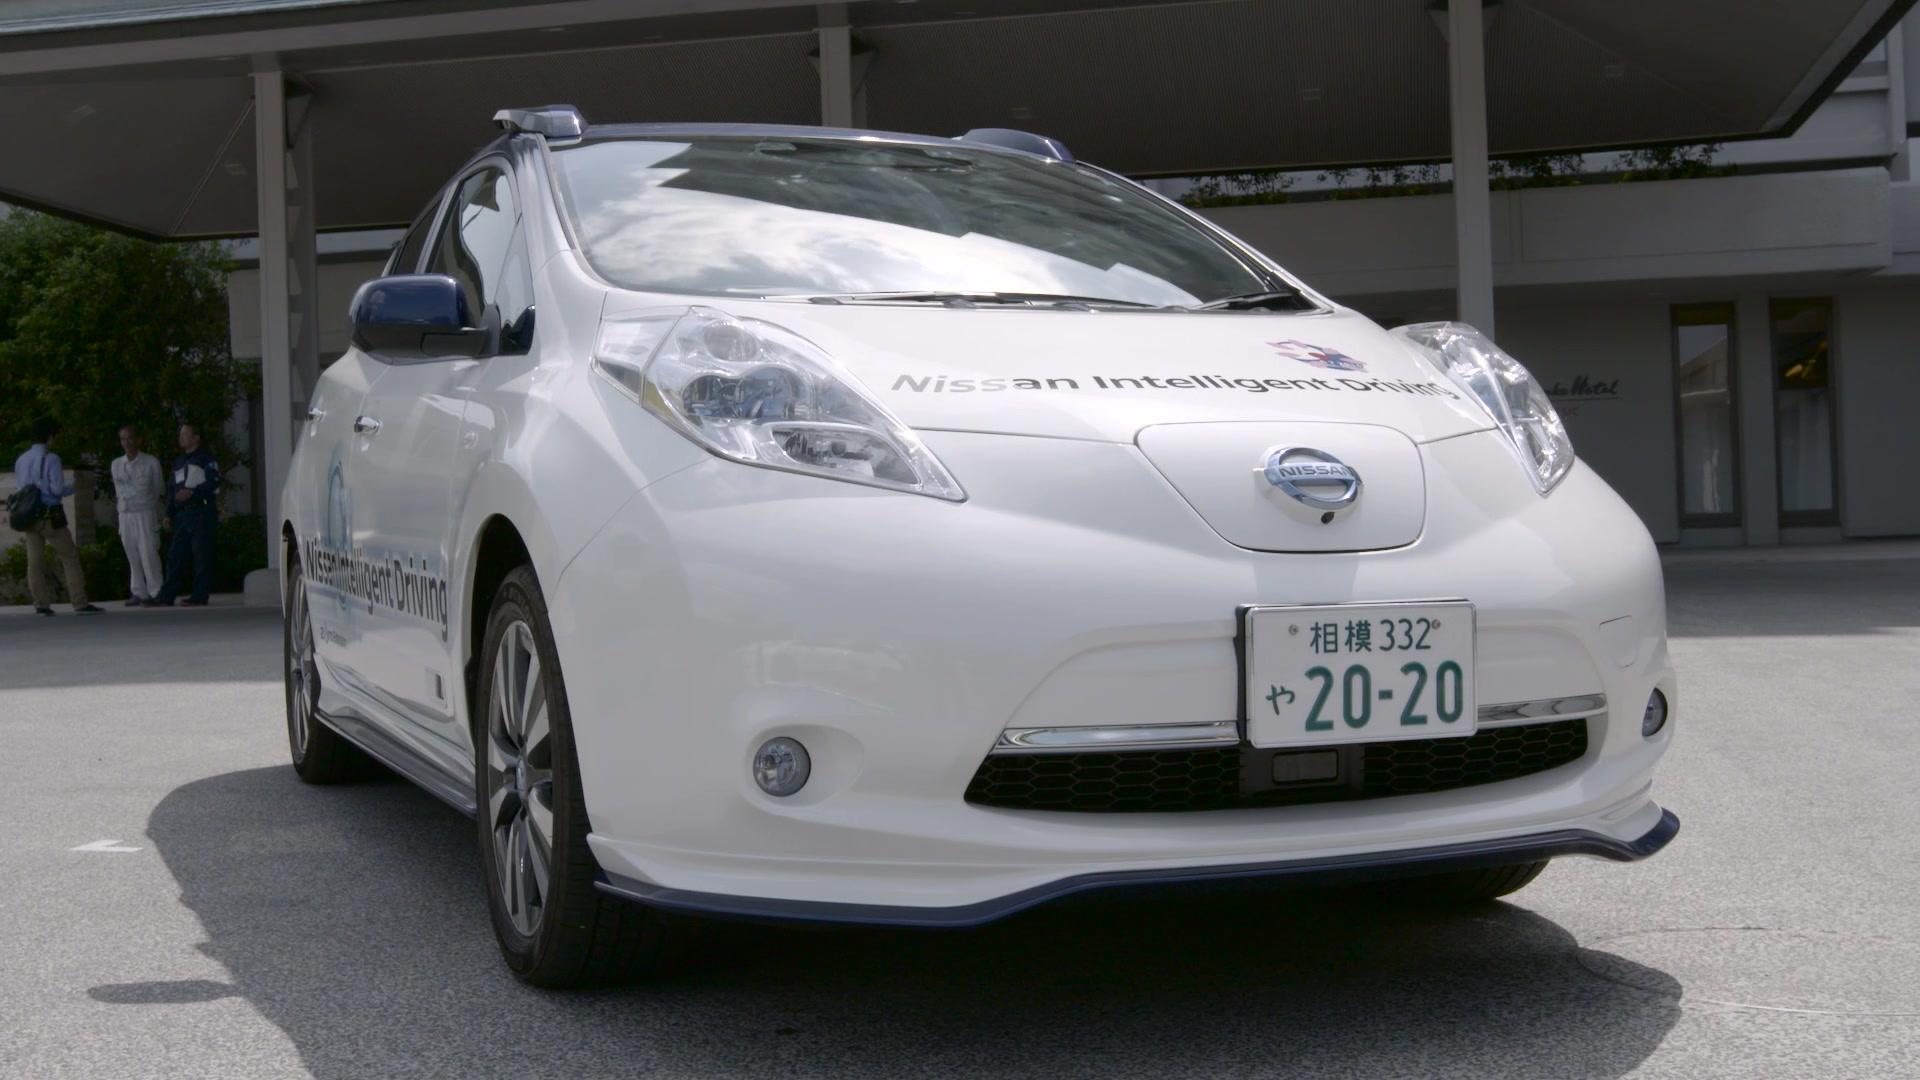 nissans rt car nissan pulsar reviews autocar